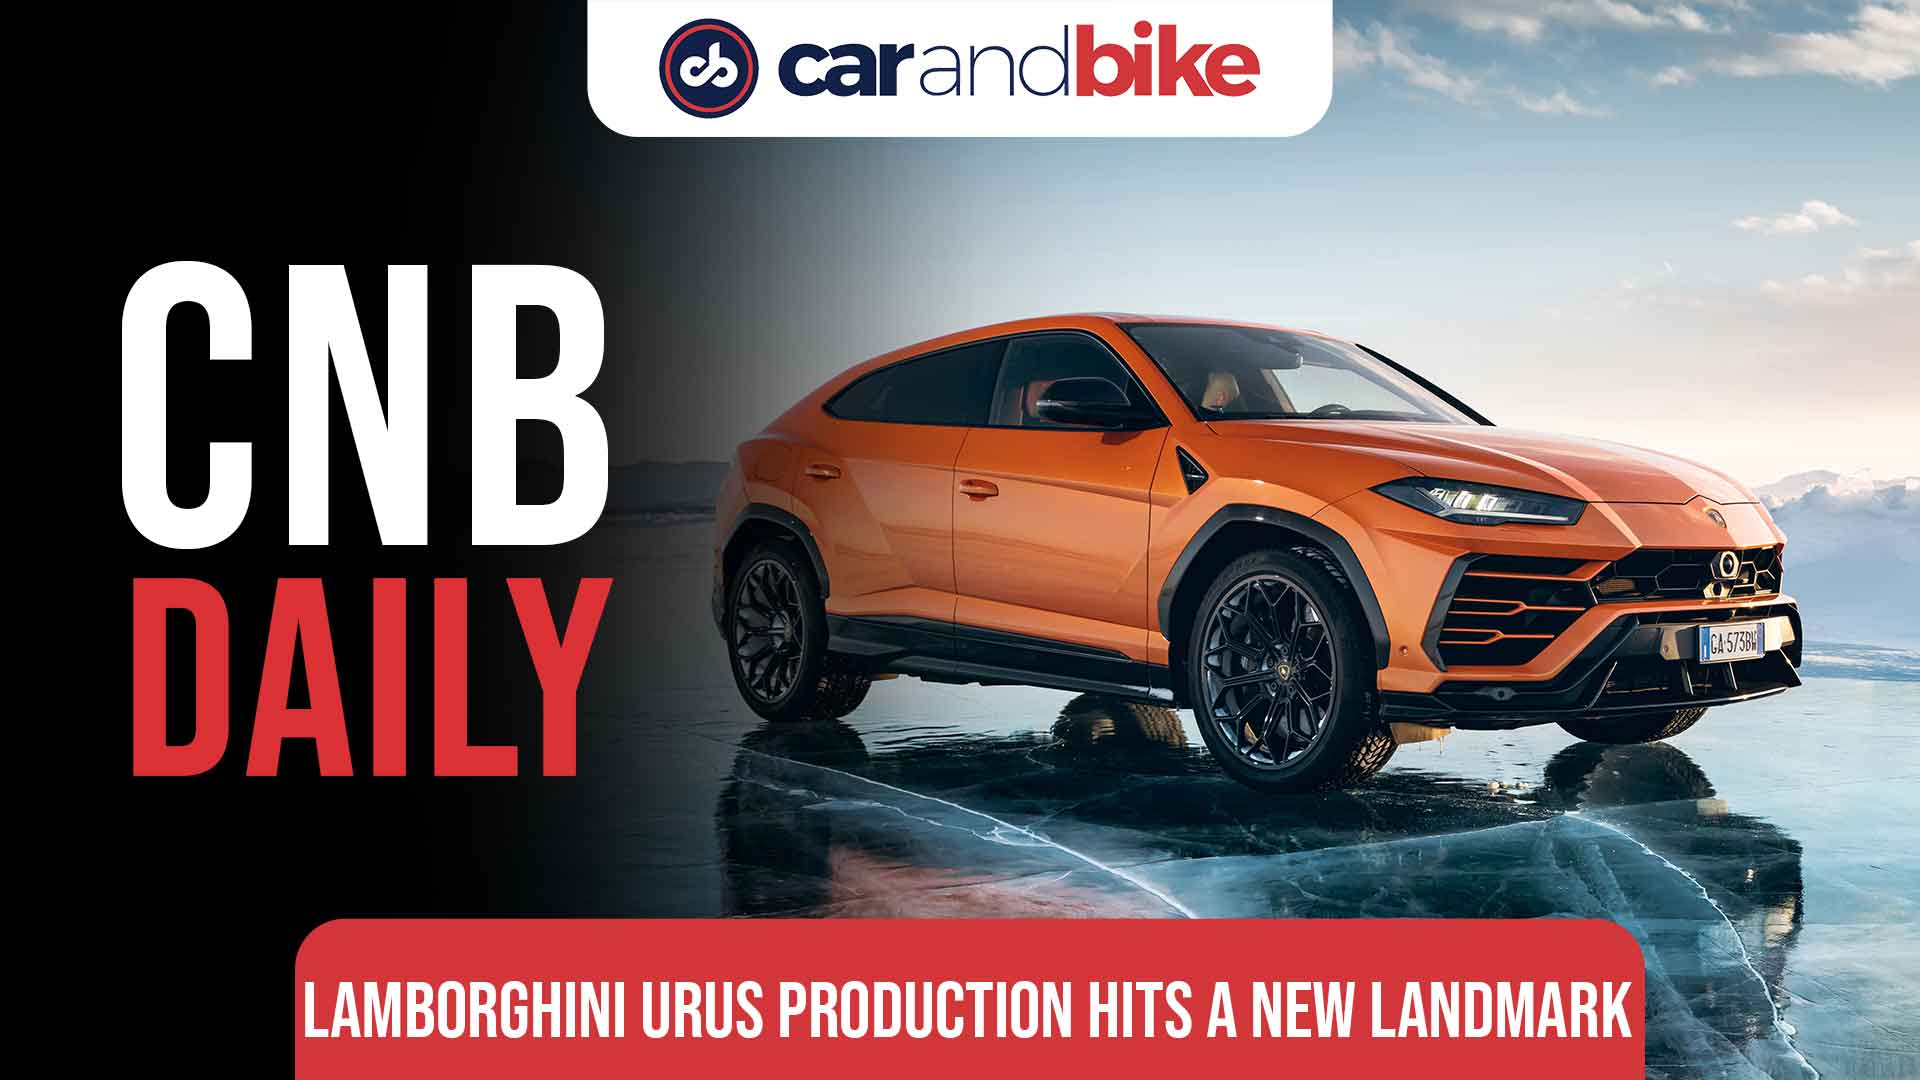 Lamborghini rolls out 15,000th unit of Urus